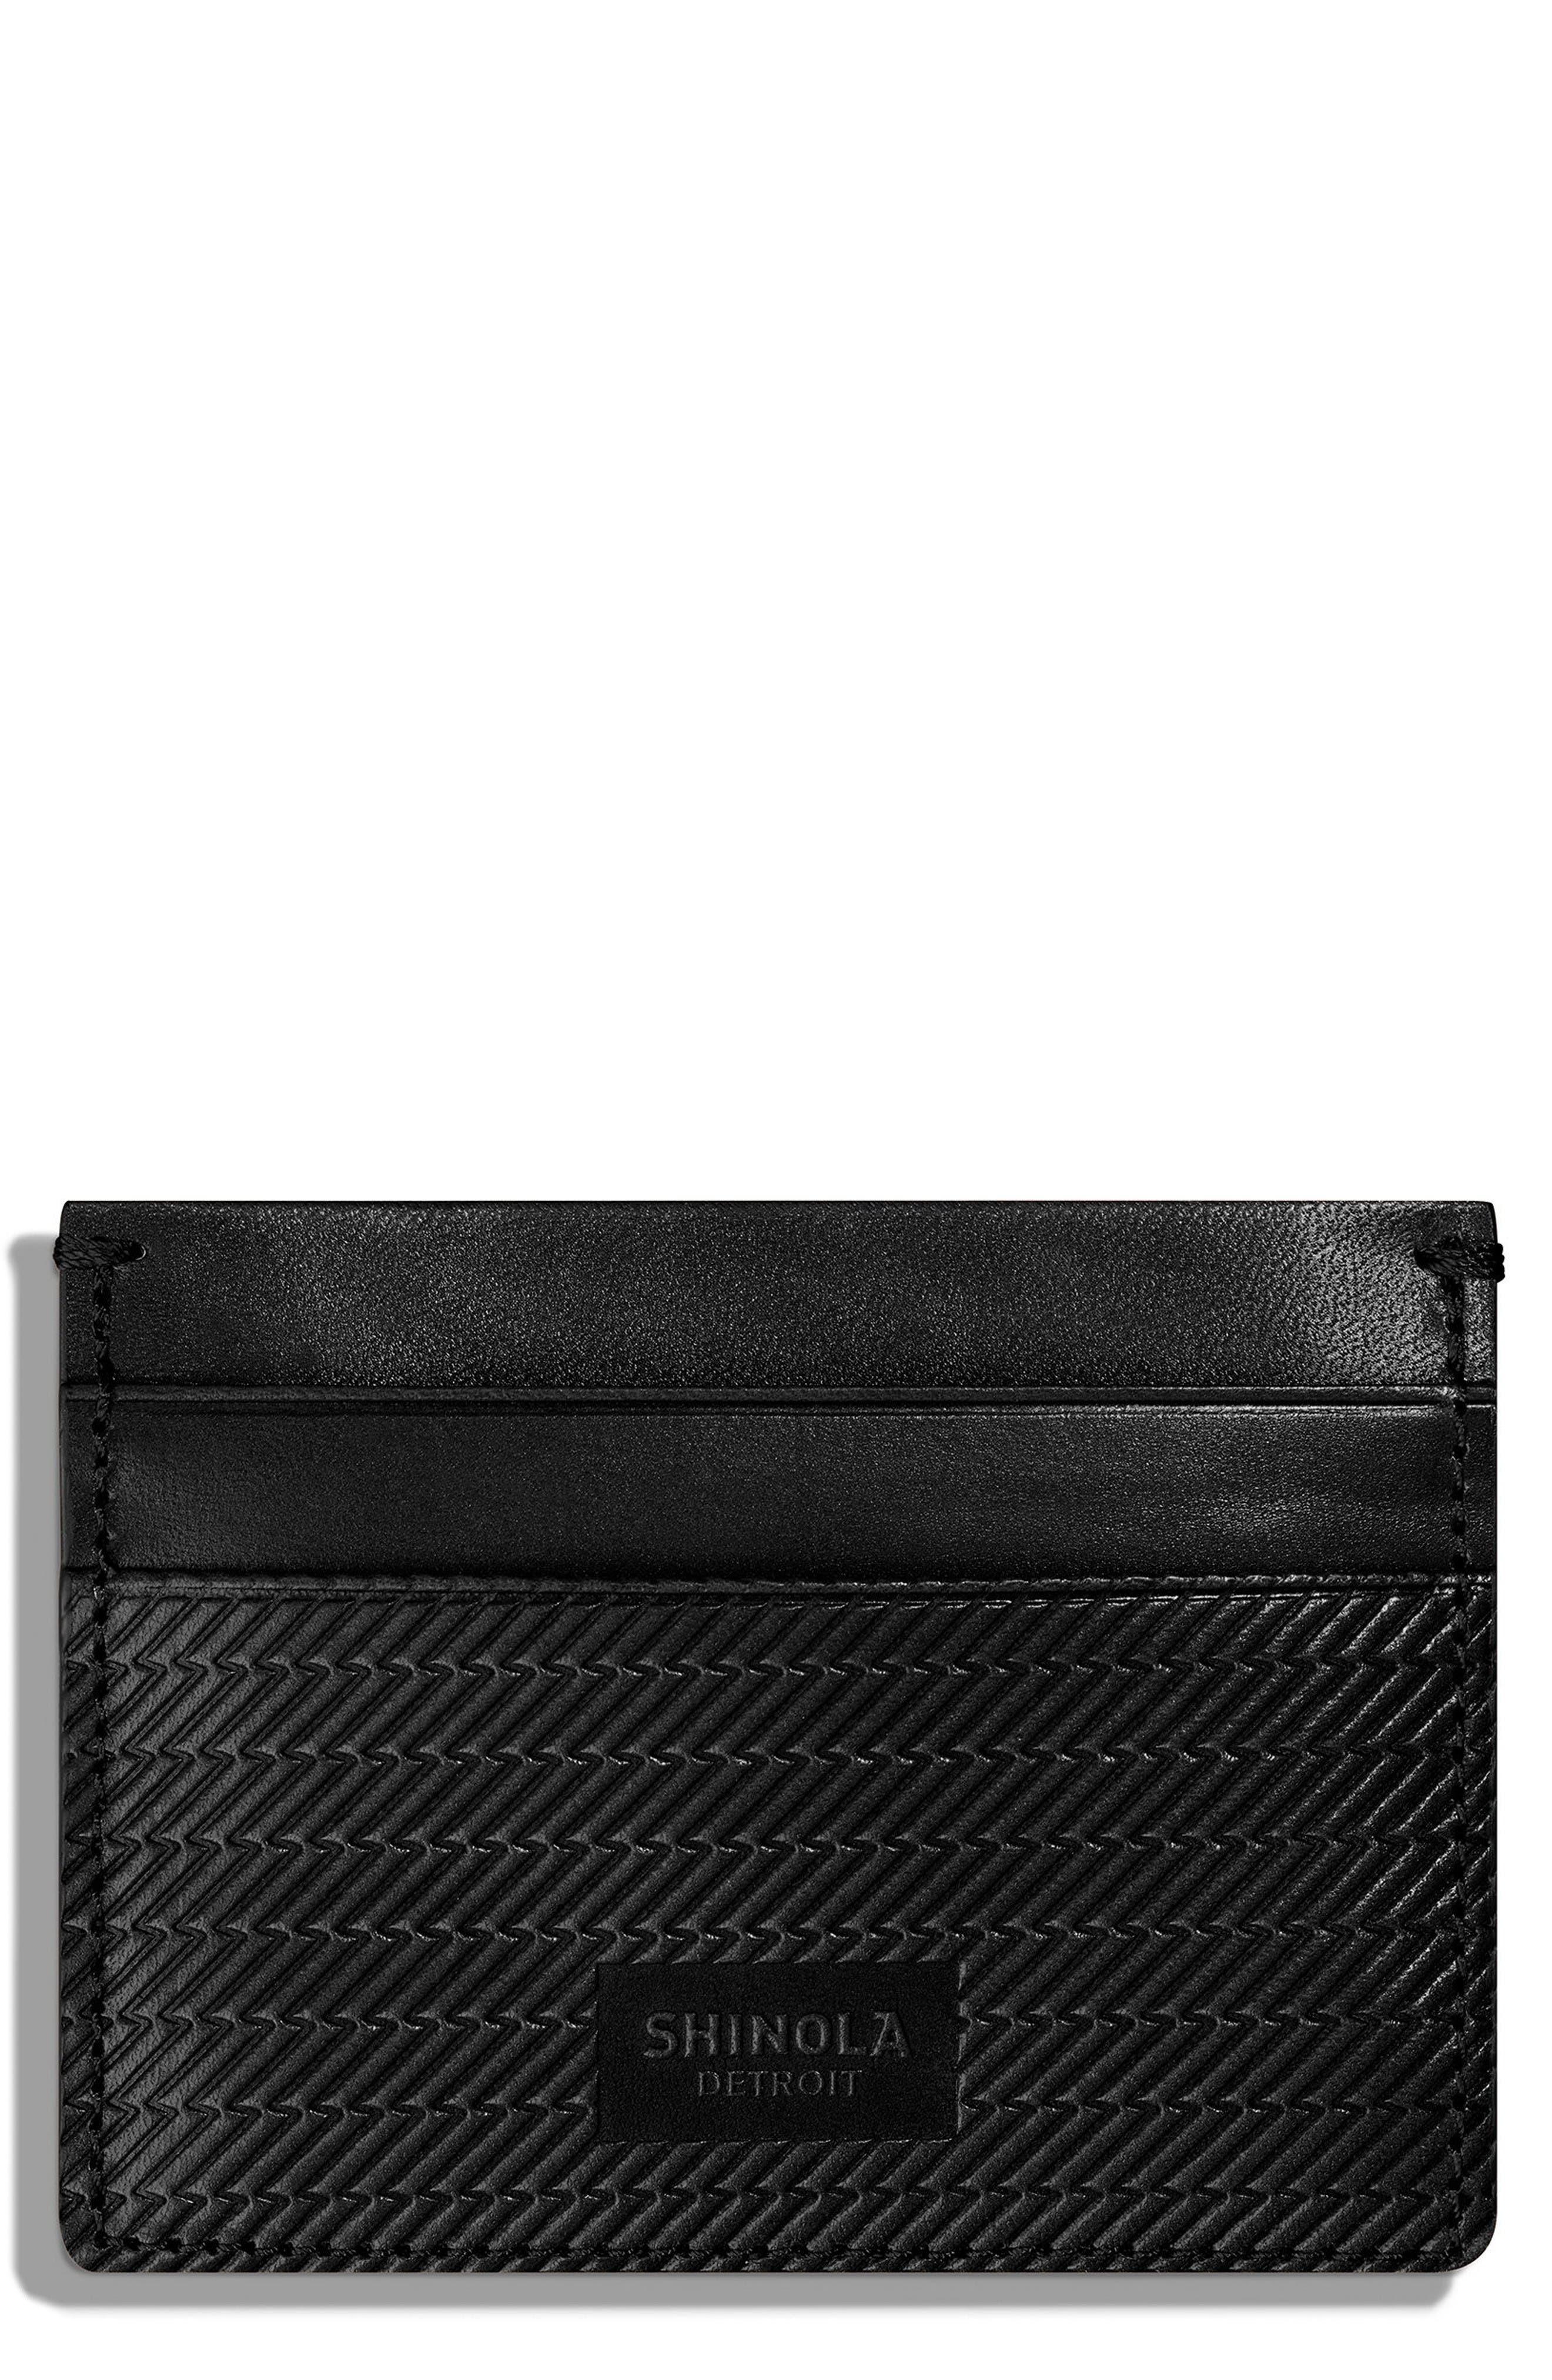 Shinola Leather Card Case